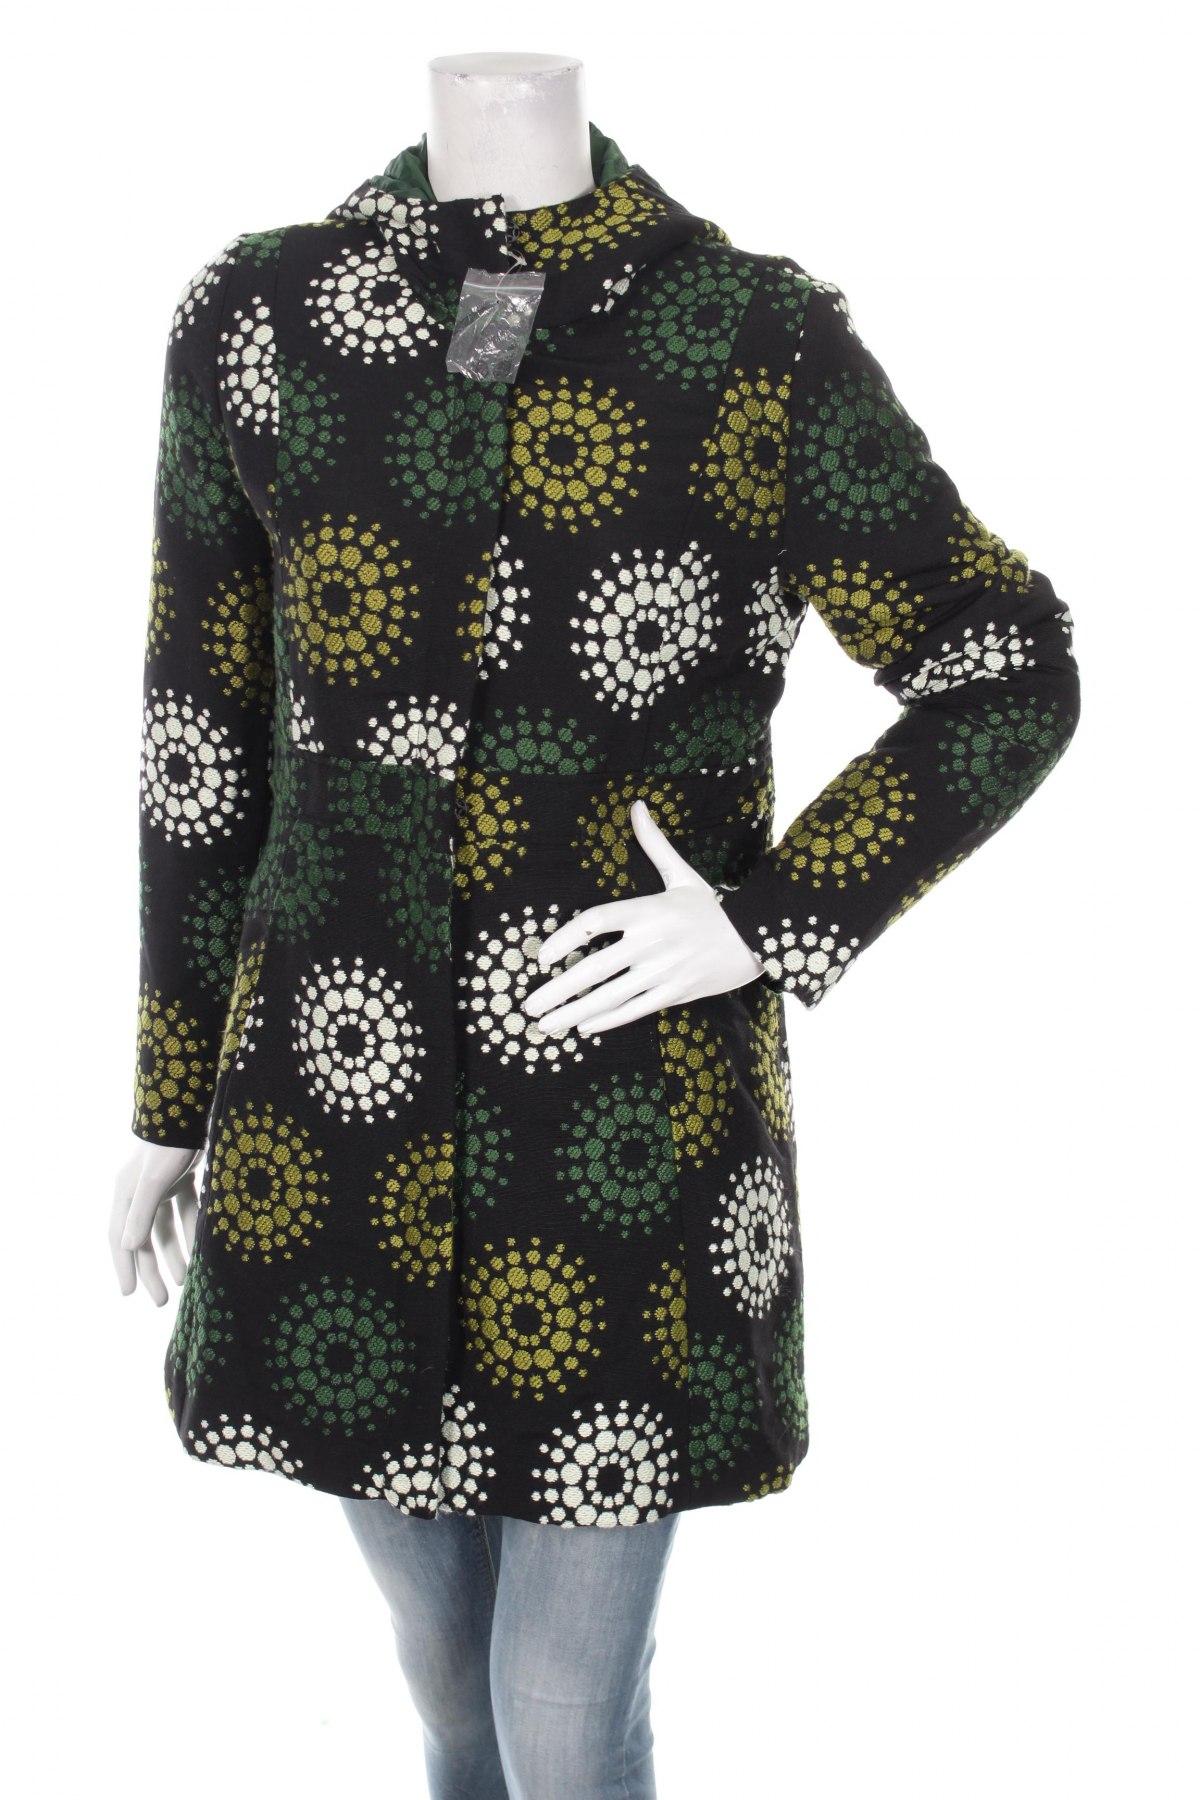 1dc7e44db4b Γυναικείο παλτό Desigual - σε συμφέρουσα τιμή στο Remix - #101415453